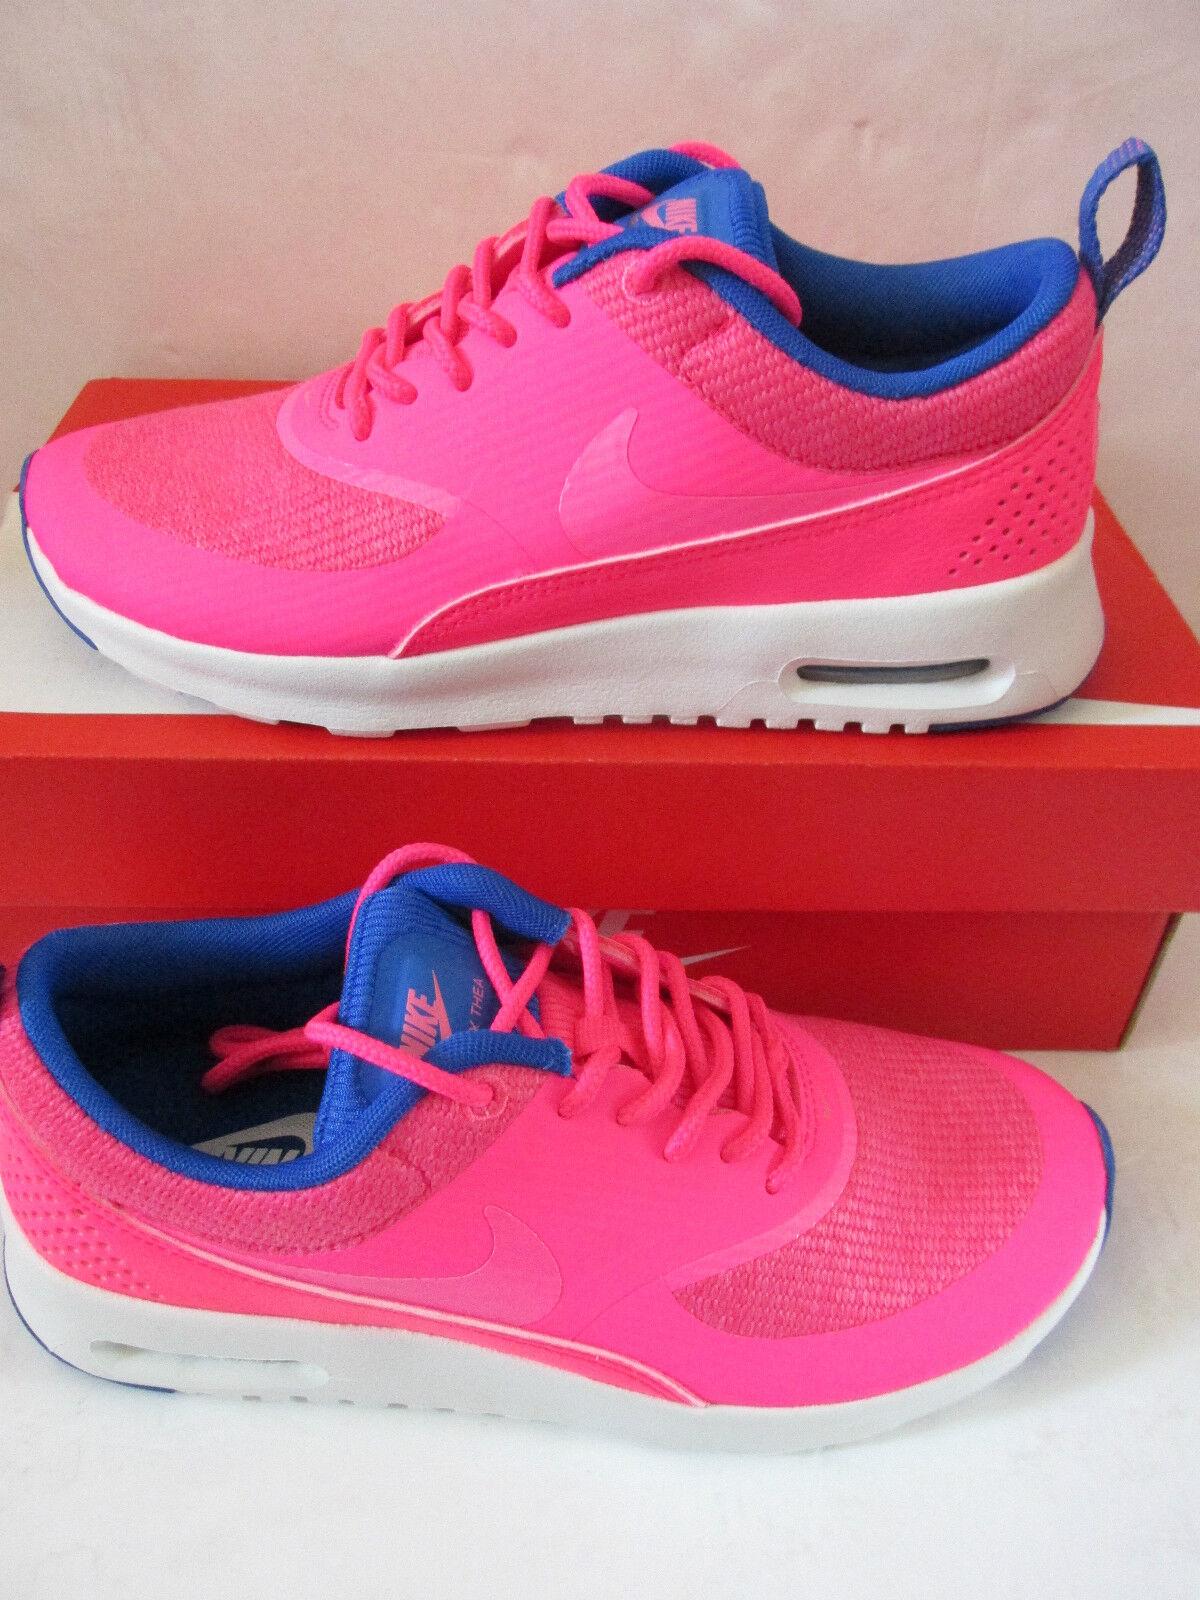 Nike Da Donna Air Max Thea Prm Scarpe da ginnastica in esecuzione Scarpe Scarpe da Ginnastica 616723 601